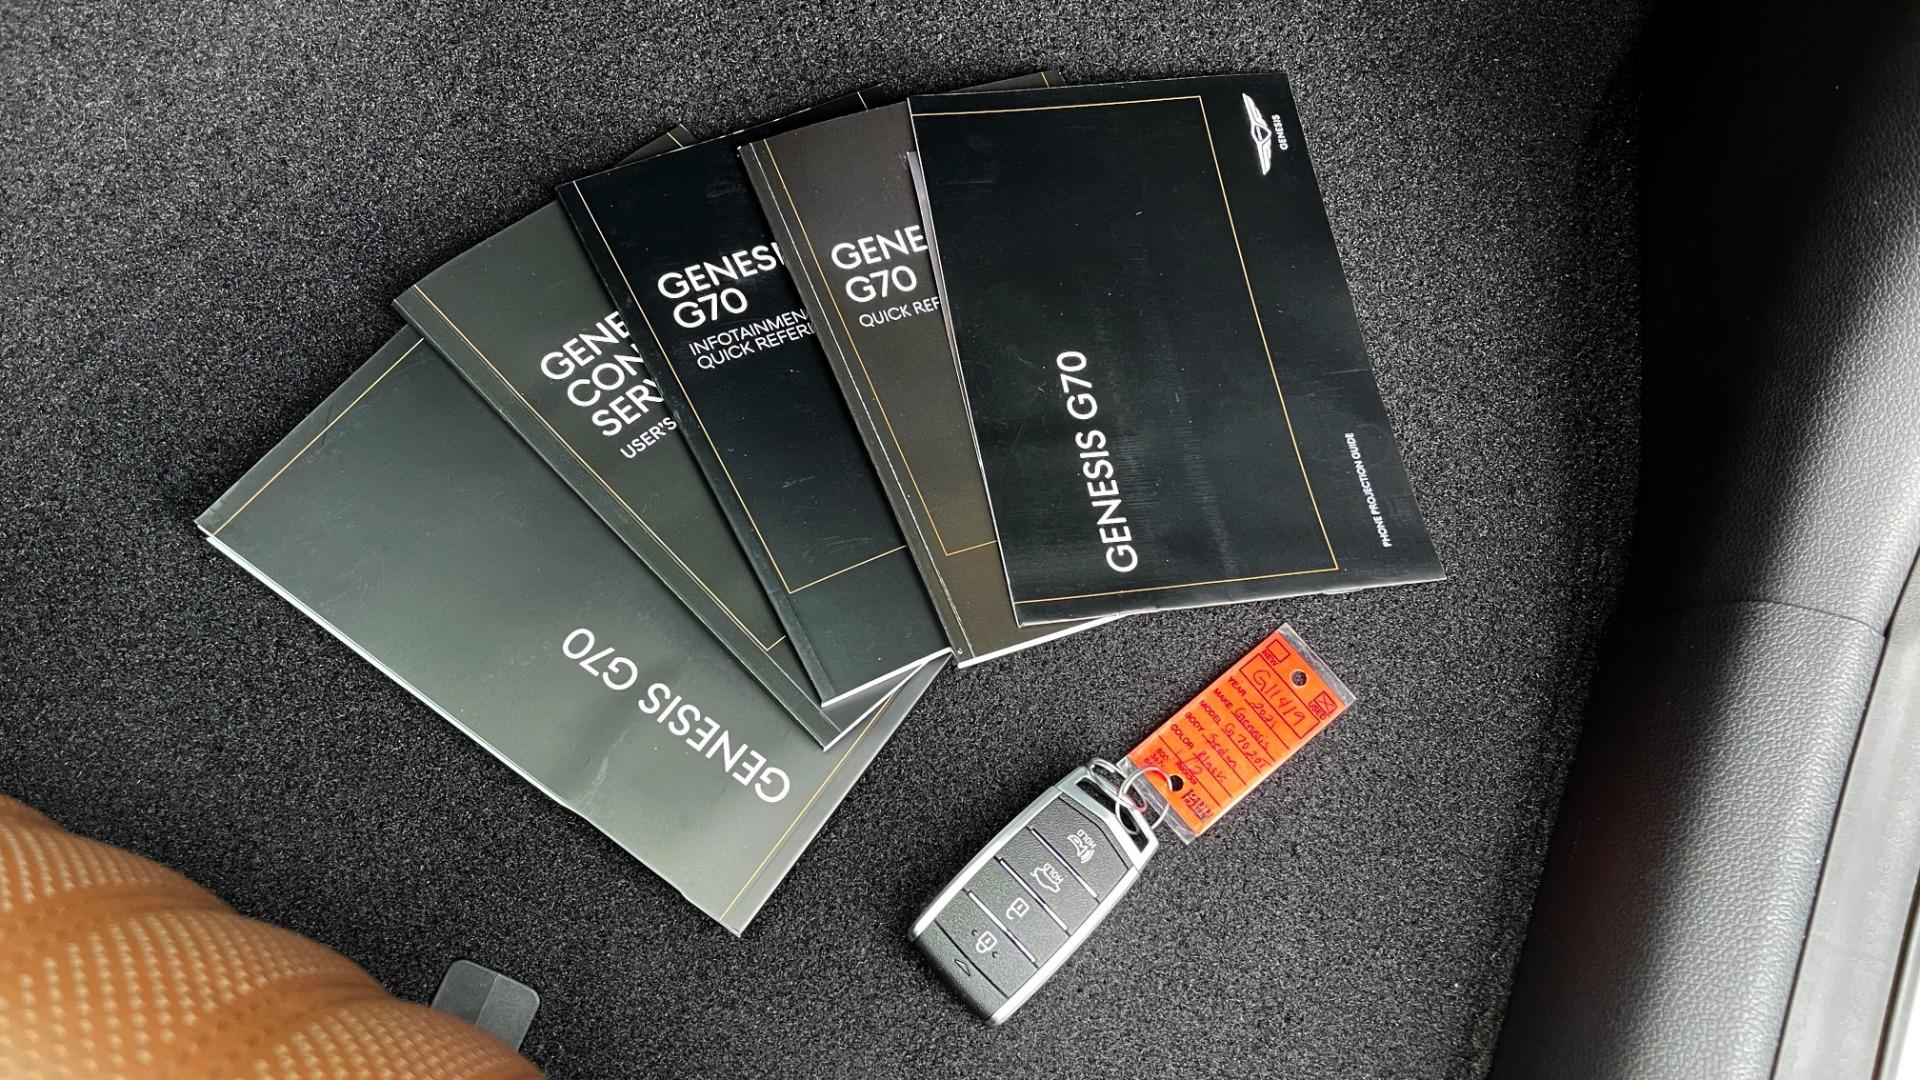 Used 2021 Genesis G70 ELITE 2.0T SEDAN / NAV / LANE ASST / BSA / SUNROOF / LEATHER / REARVIEW for sale $39,995 at Formula Imports in Charlotte NC 28227 68